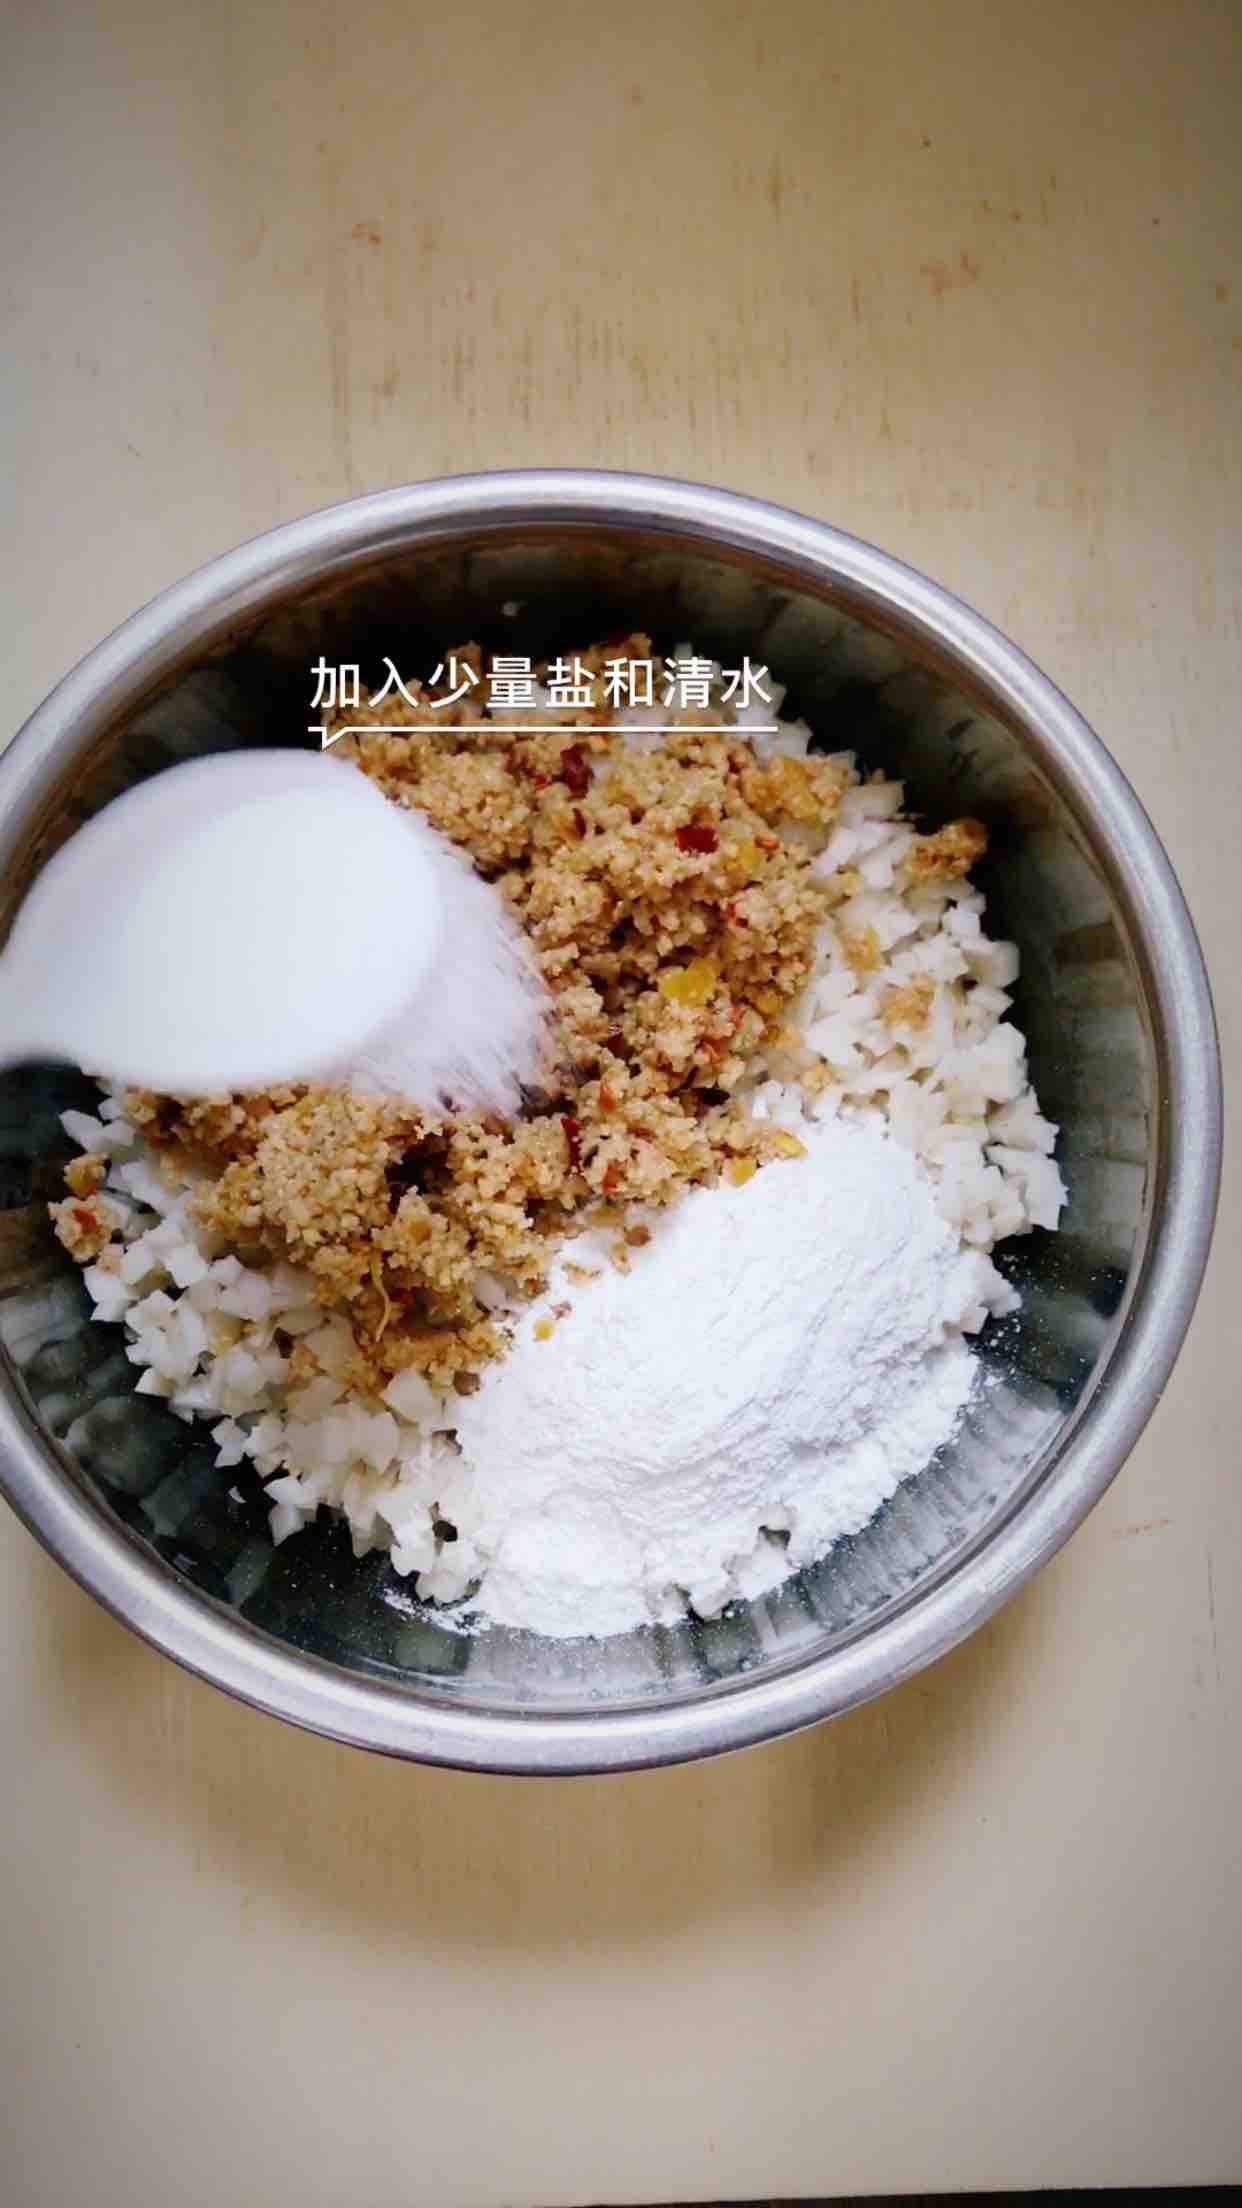 糯鮓藕饼怎么煮